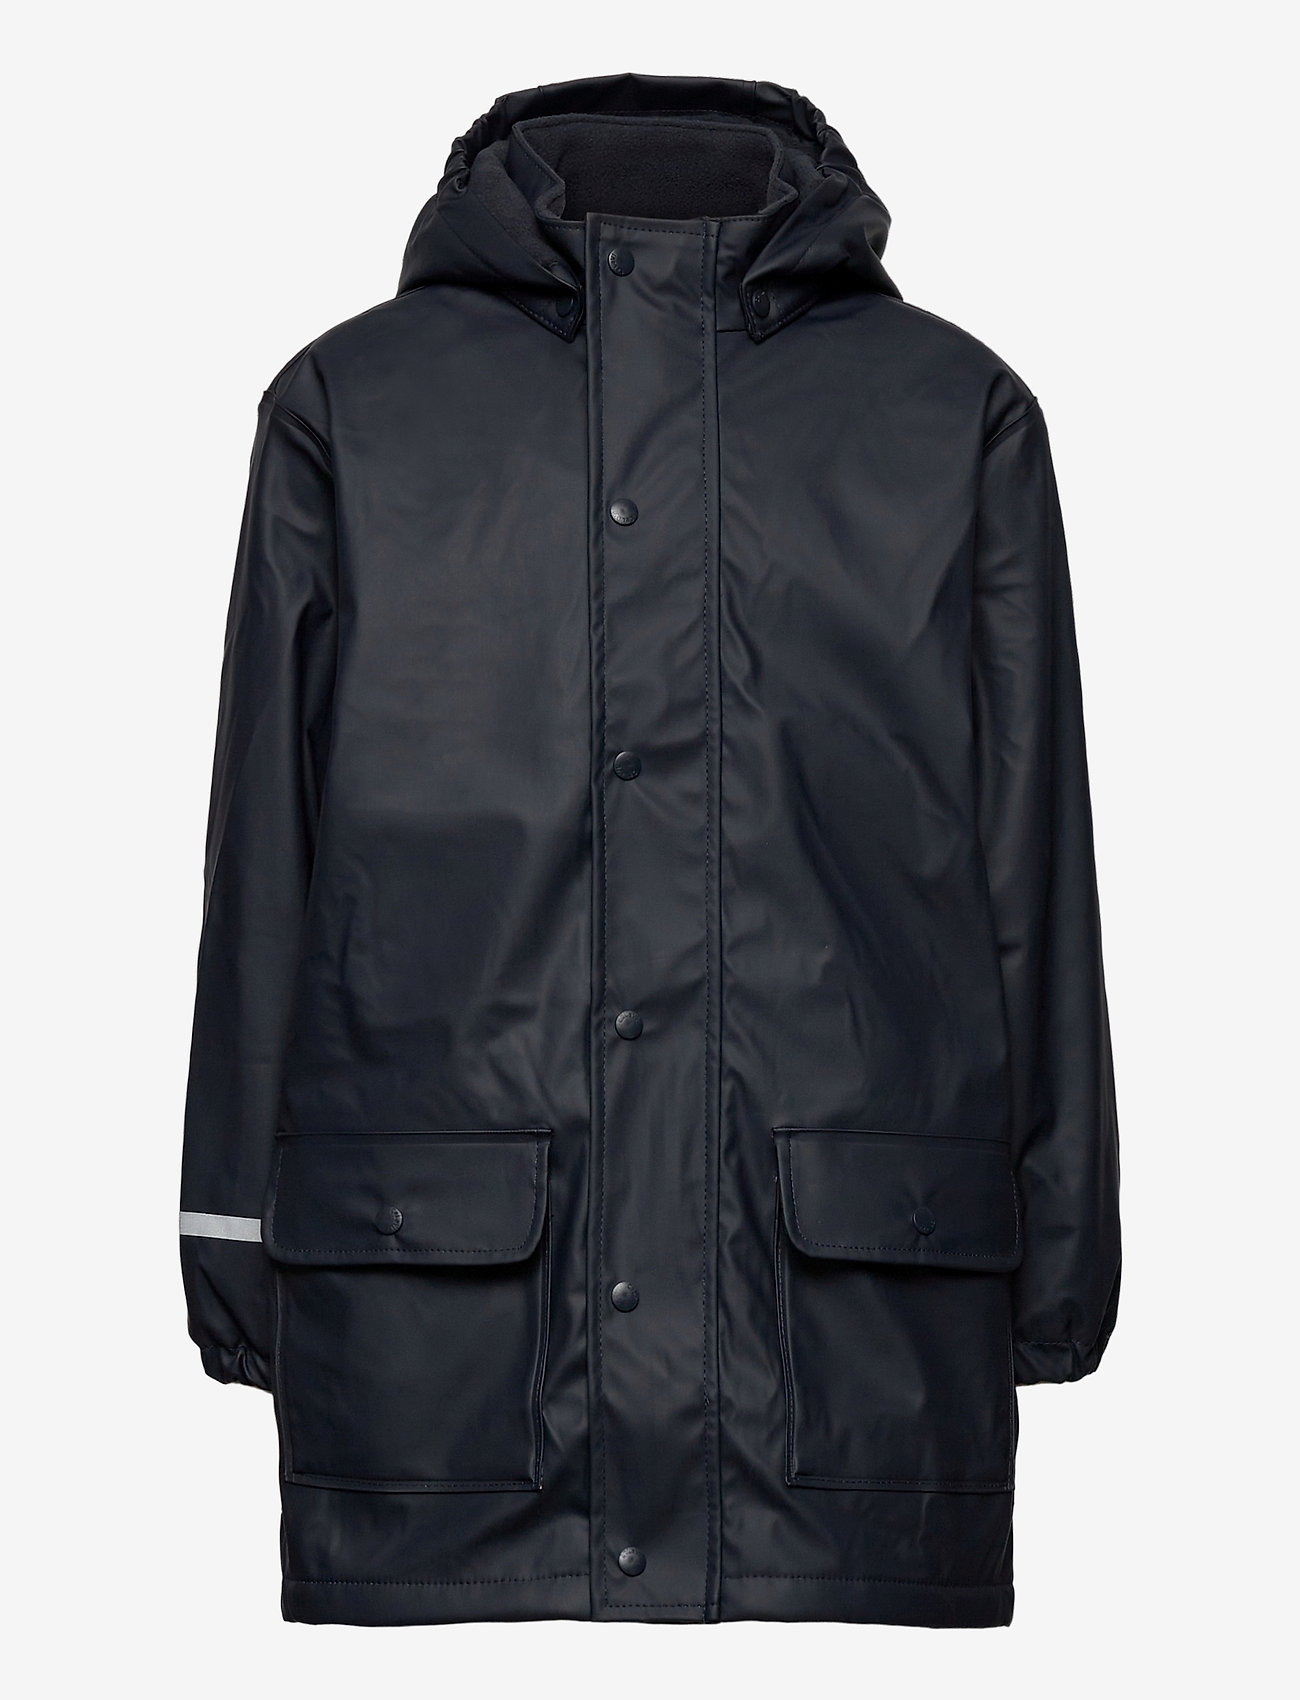 CeLaVi - Raincoat  - w. fleece - jassen - navy - 0